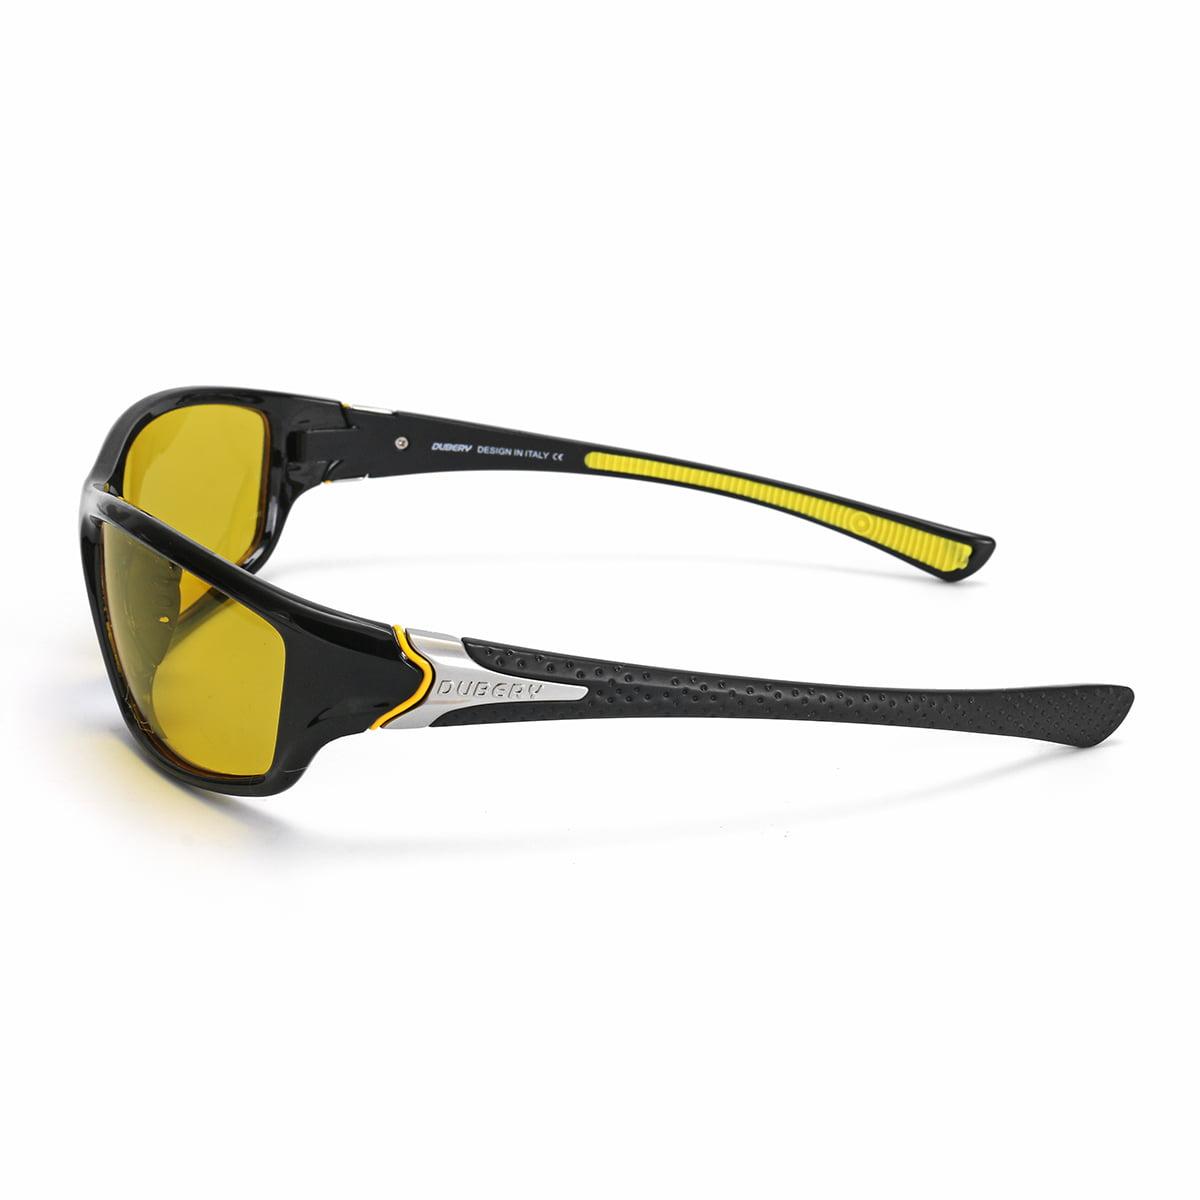 DUBERY Men Brand Designer Sunglasses Polarized Cycling Sport Driving Sun Glasses